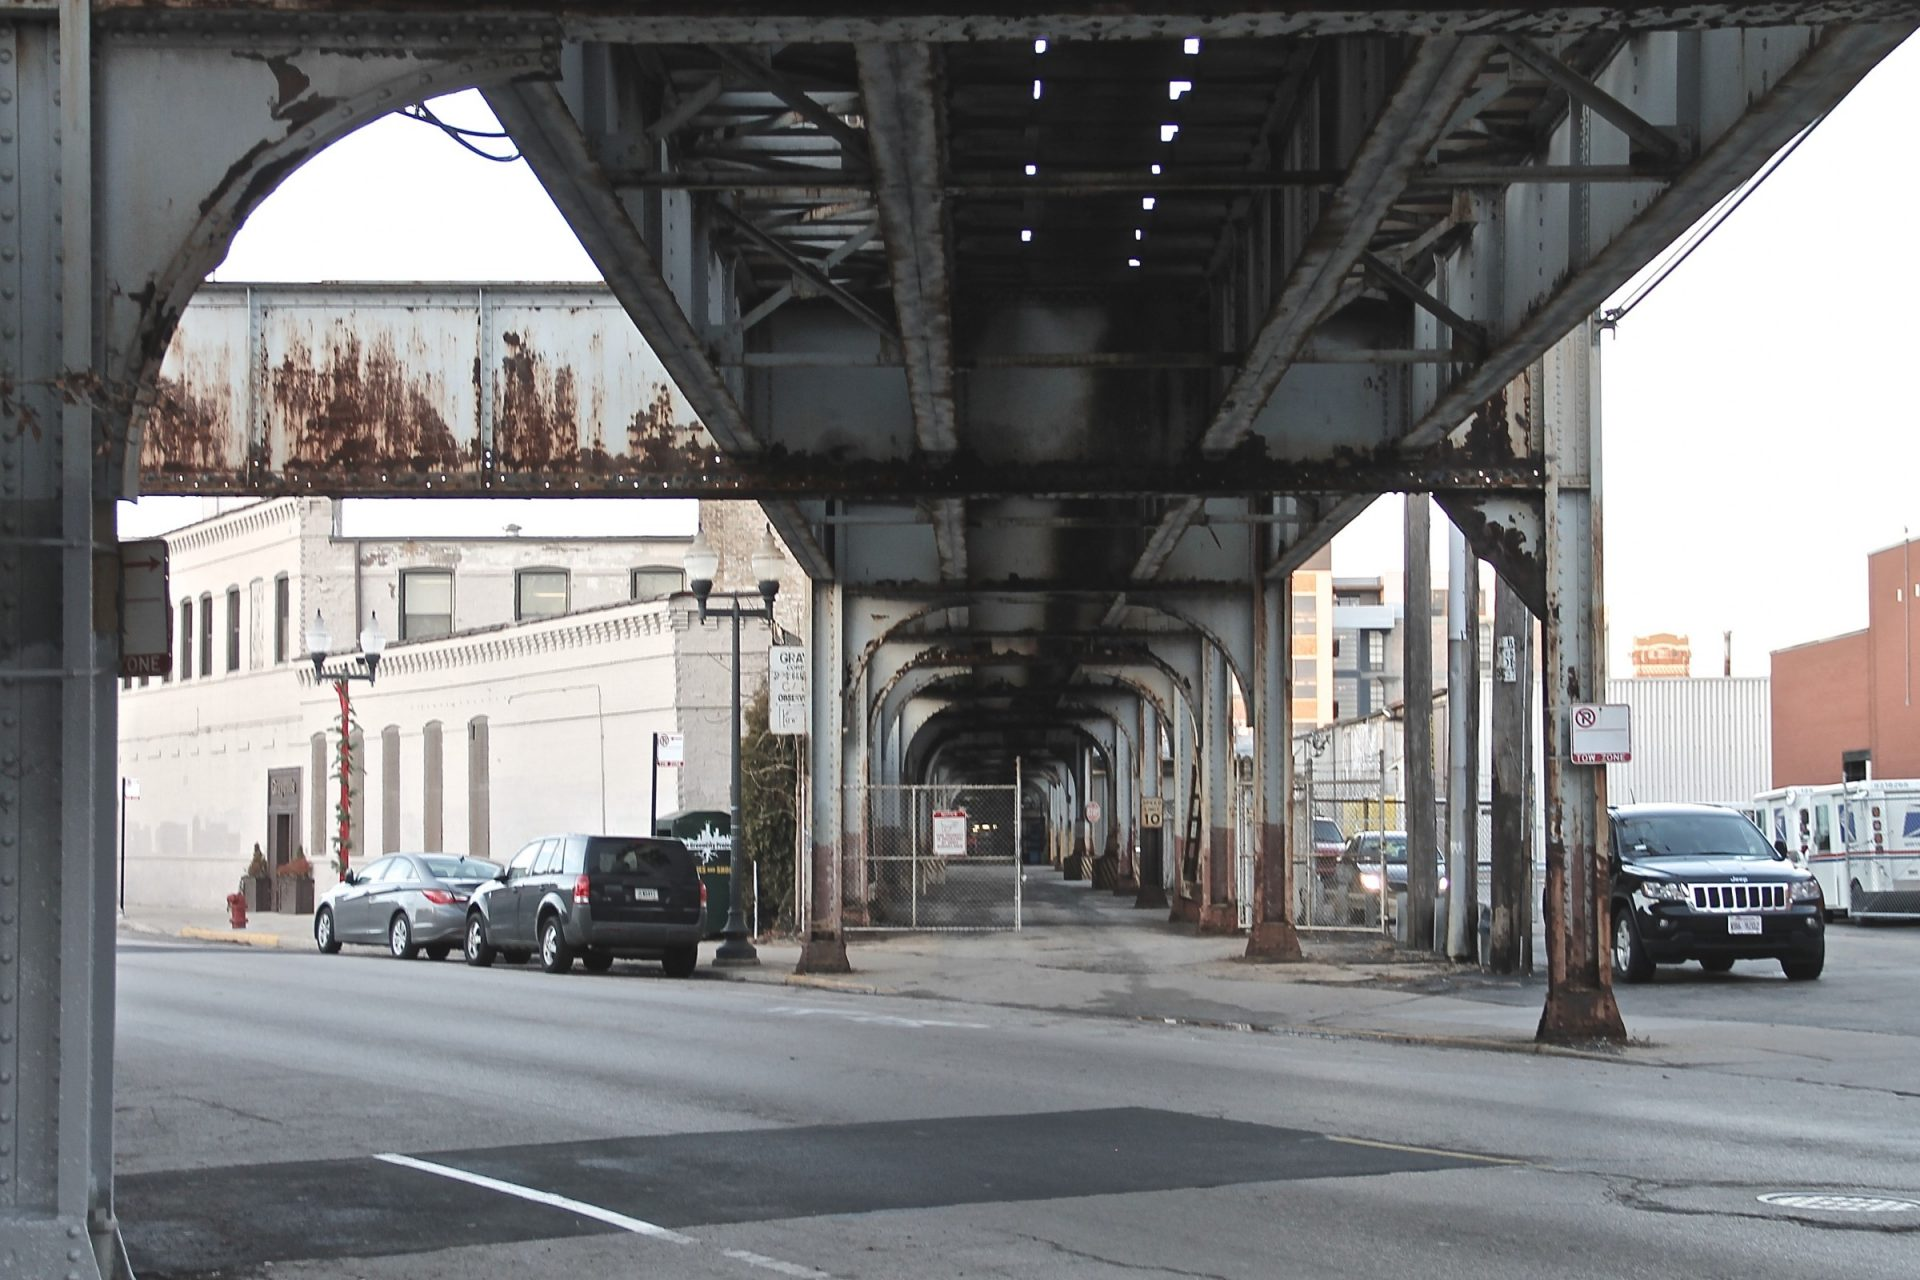 Rusted Metal Bridge Over Street